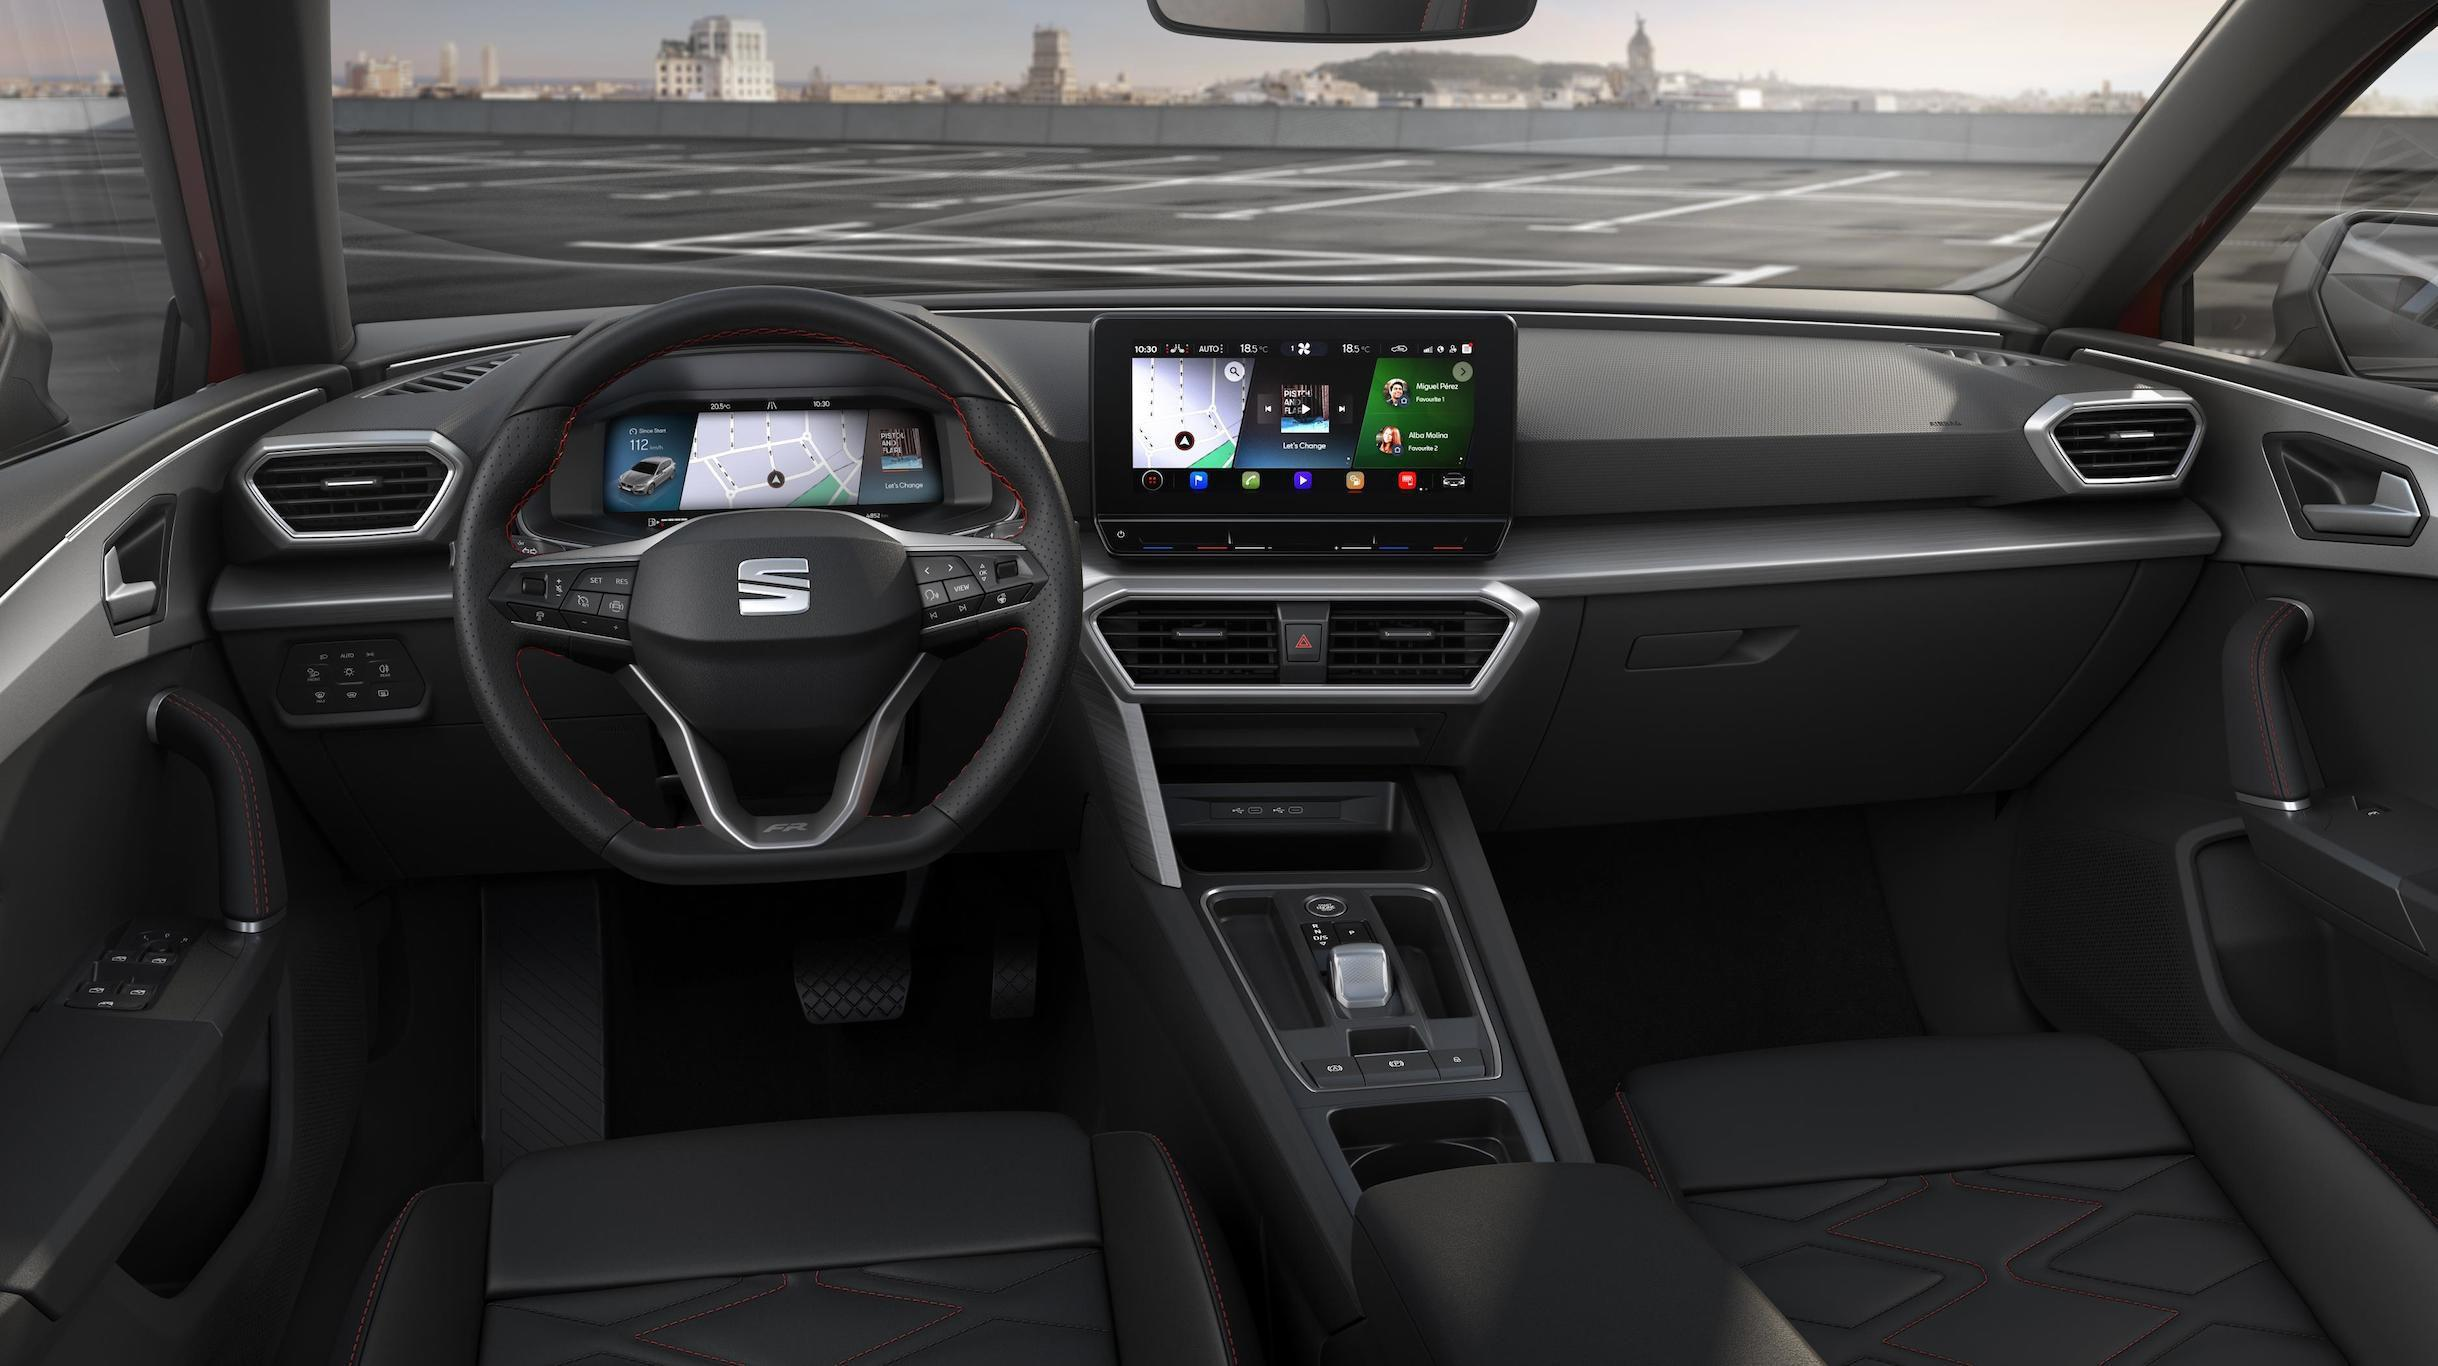 Ekskluzivno: Predstavljen novi Seat Leon! 2